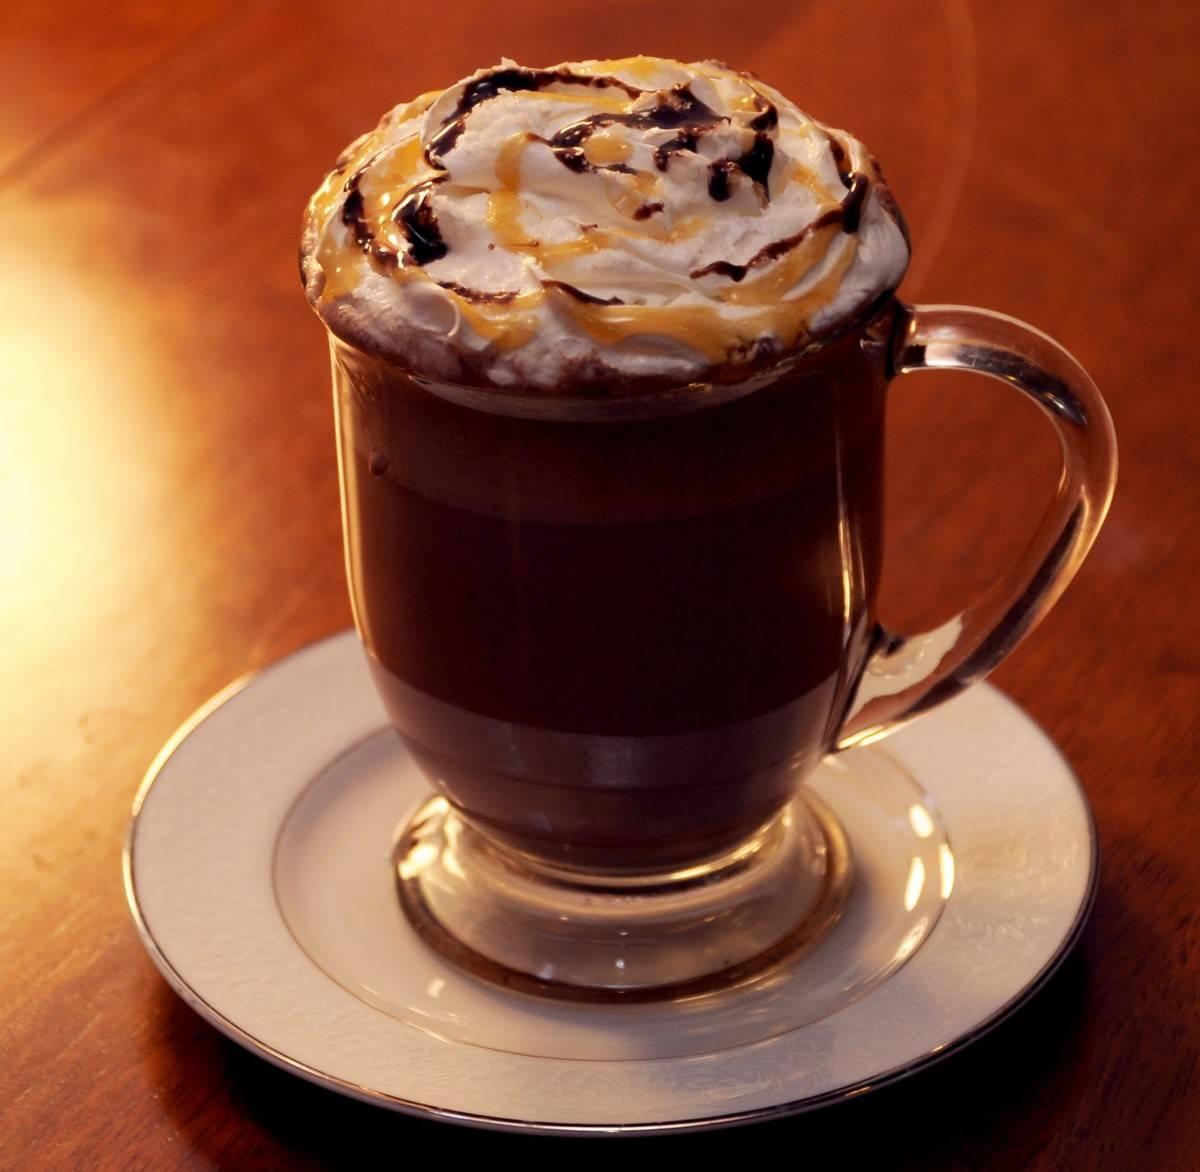 Кофе мокко вкусно до последней капли рецепт с фото